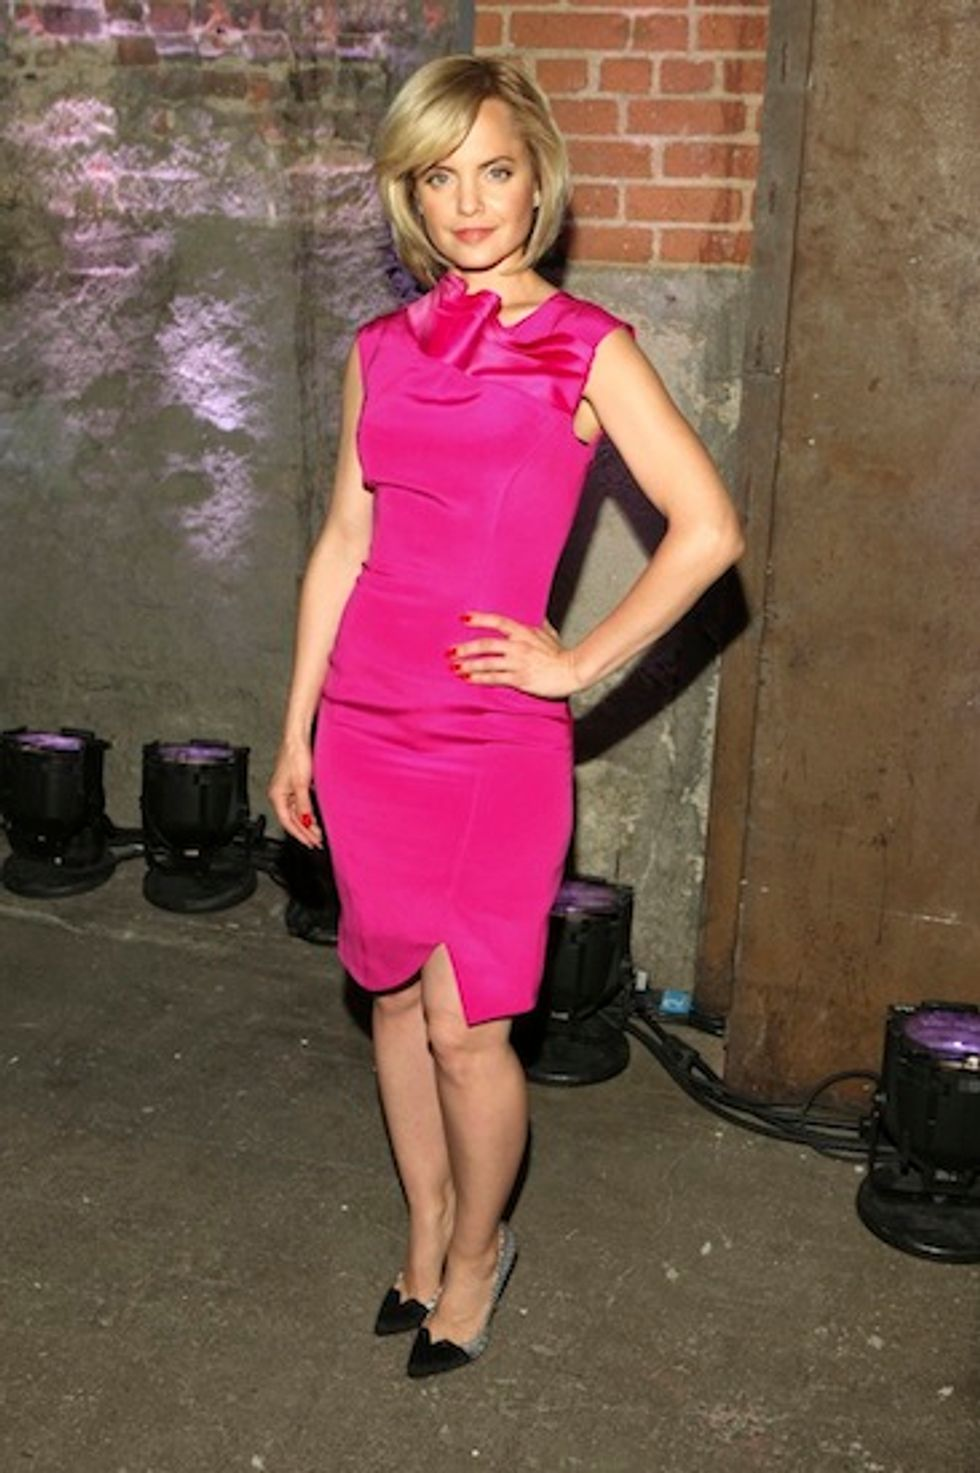 Mena Suvari Has a Barbie Moment at the Christian Siriano Show